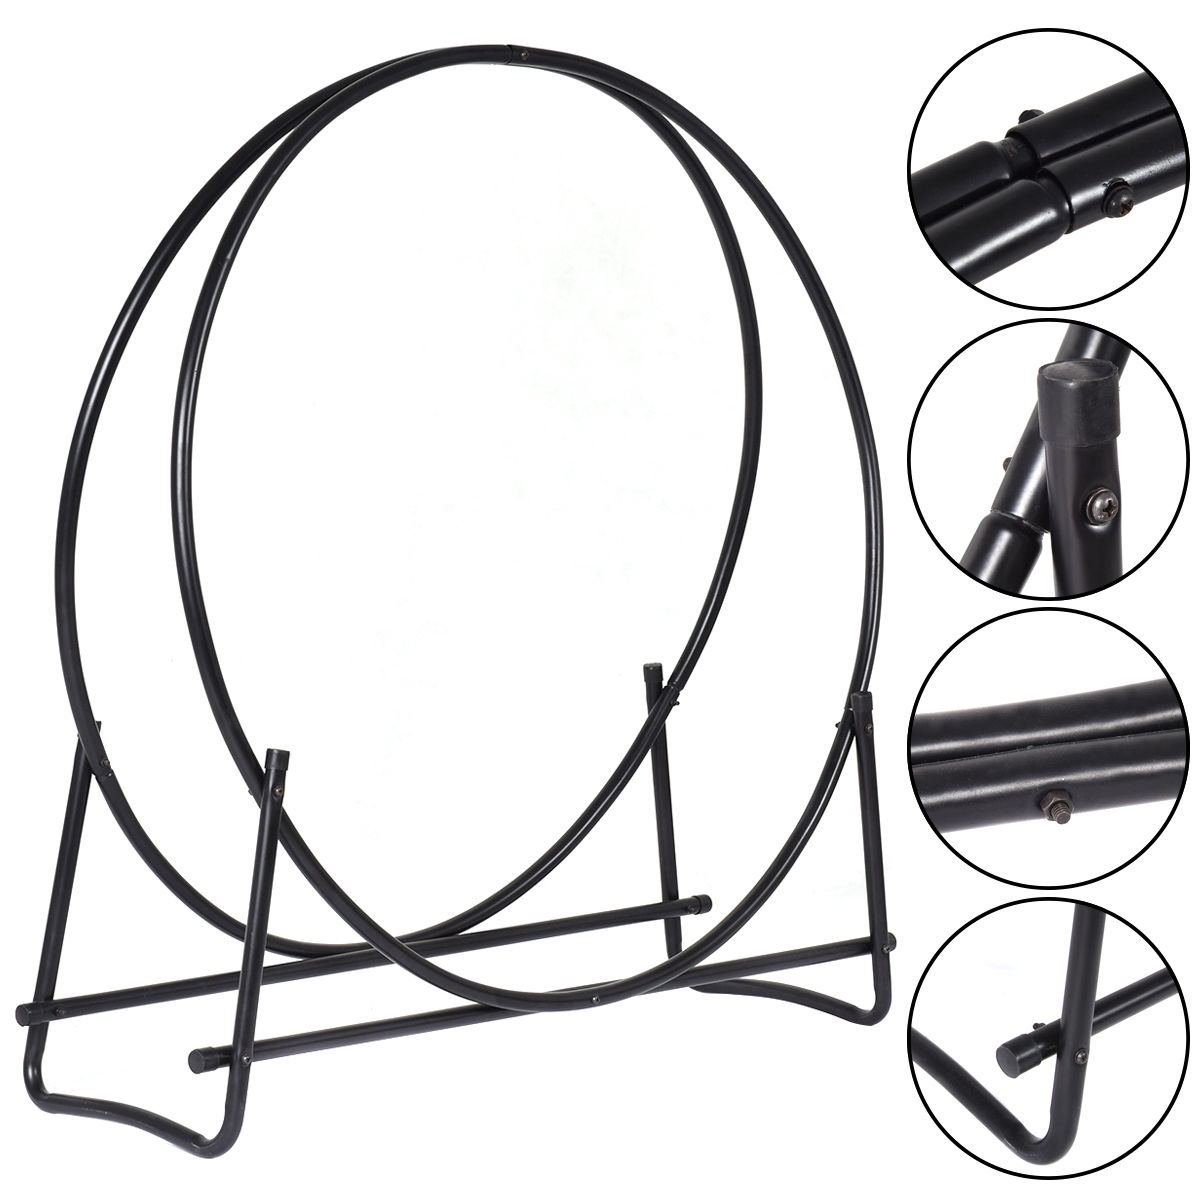 MasterPanel - 40-Inch Tubular Steel Log Hoop Firewood Storage Rack Holder Round Display #TP3284